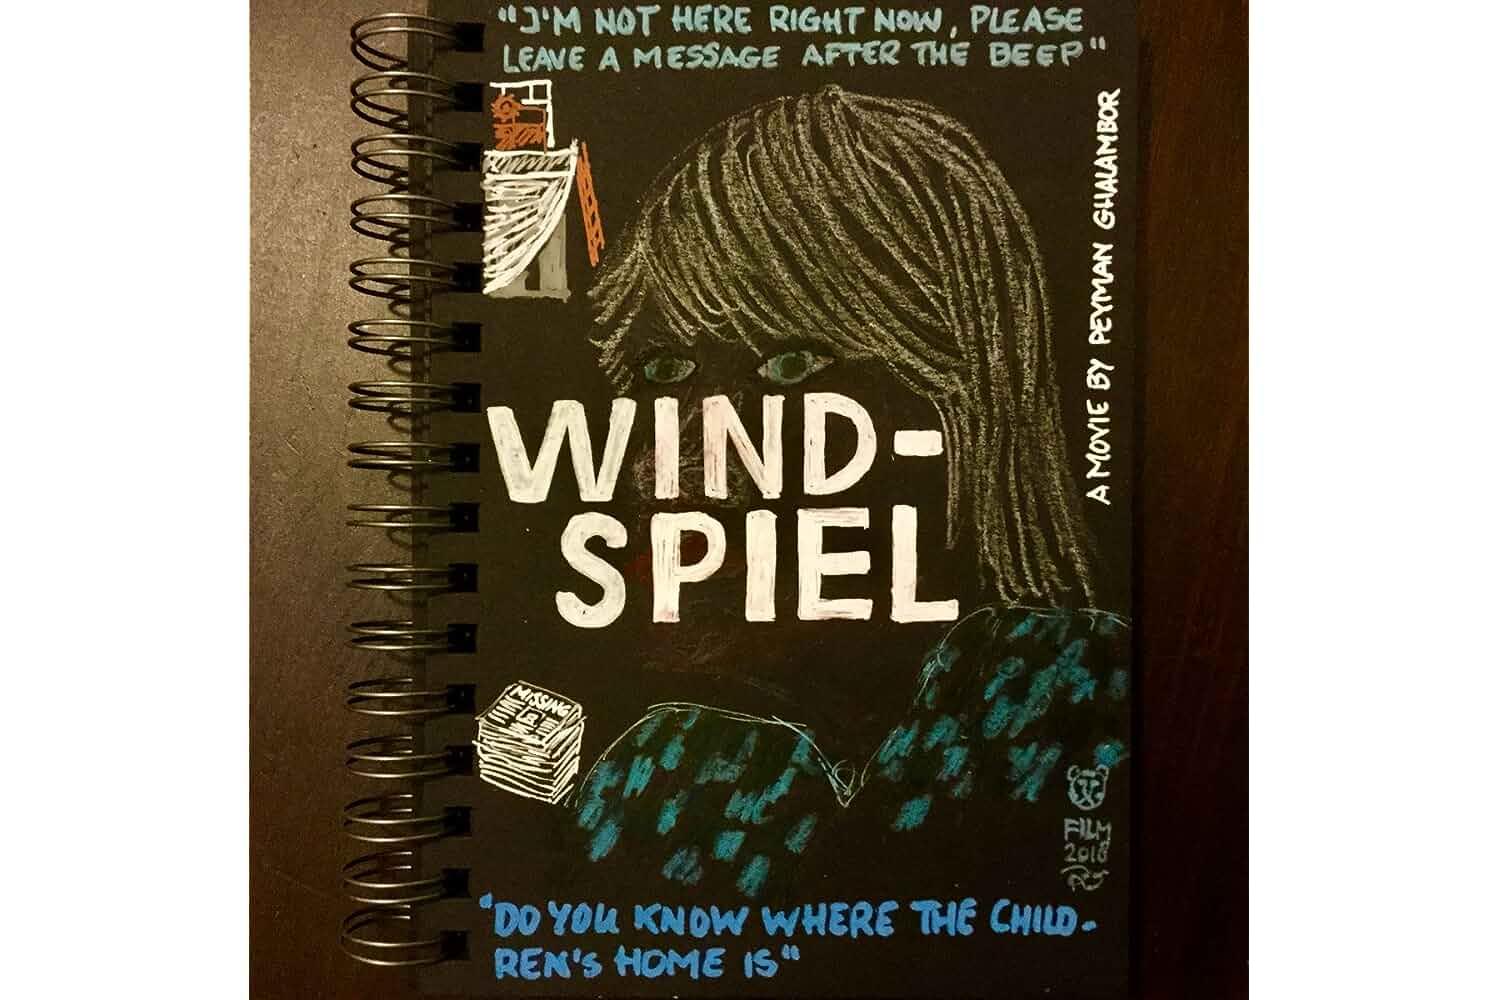 Windspiel (2018)